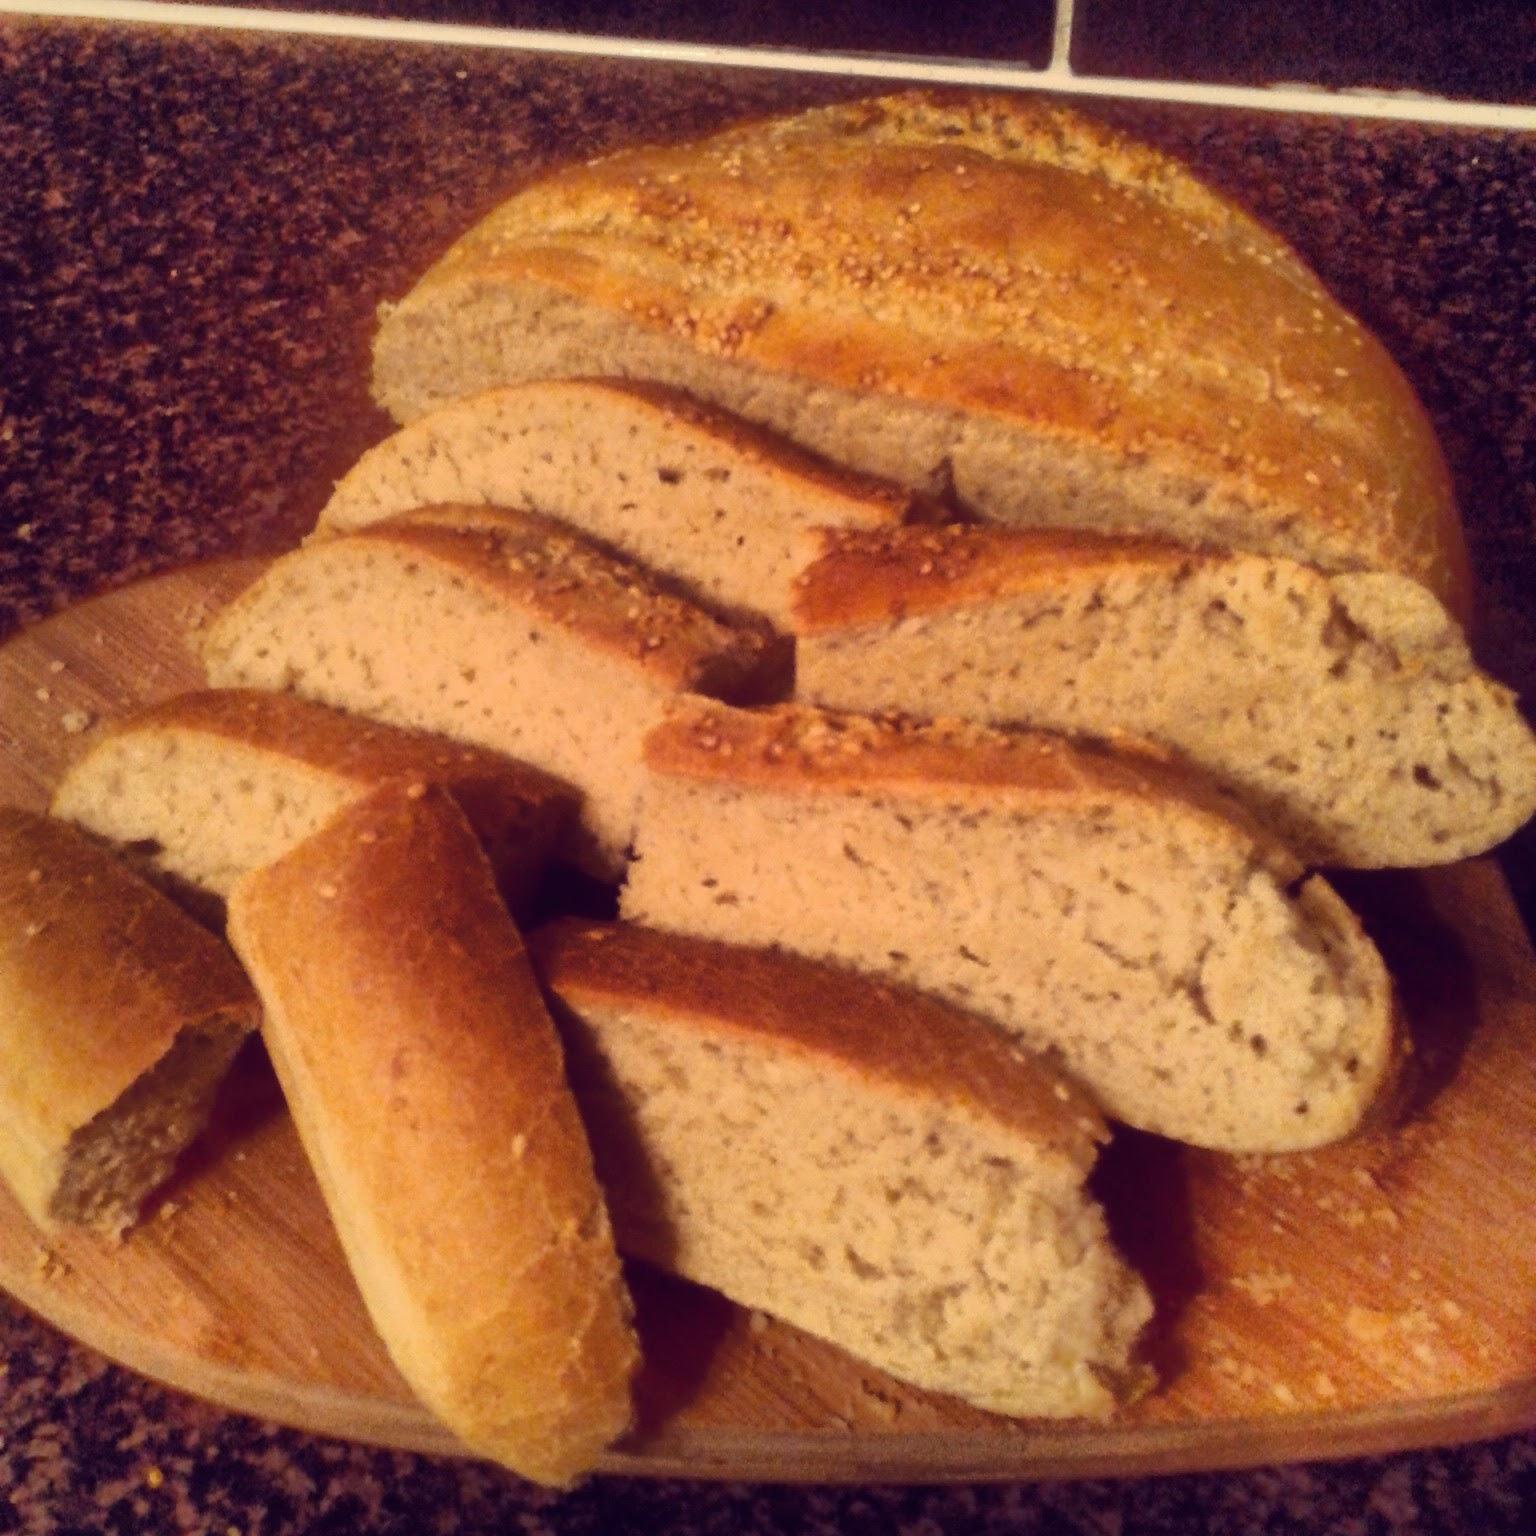 Sesame Seed Loaf